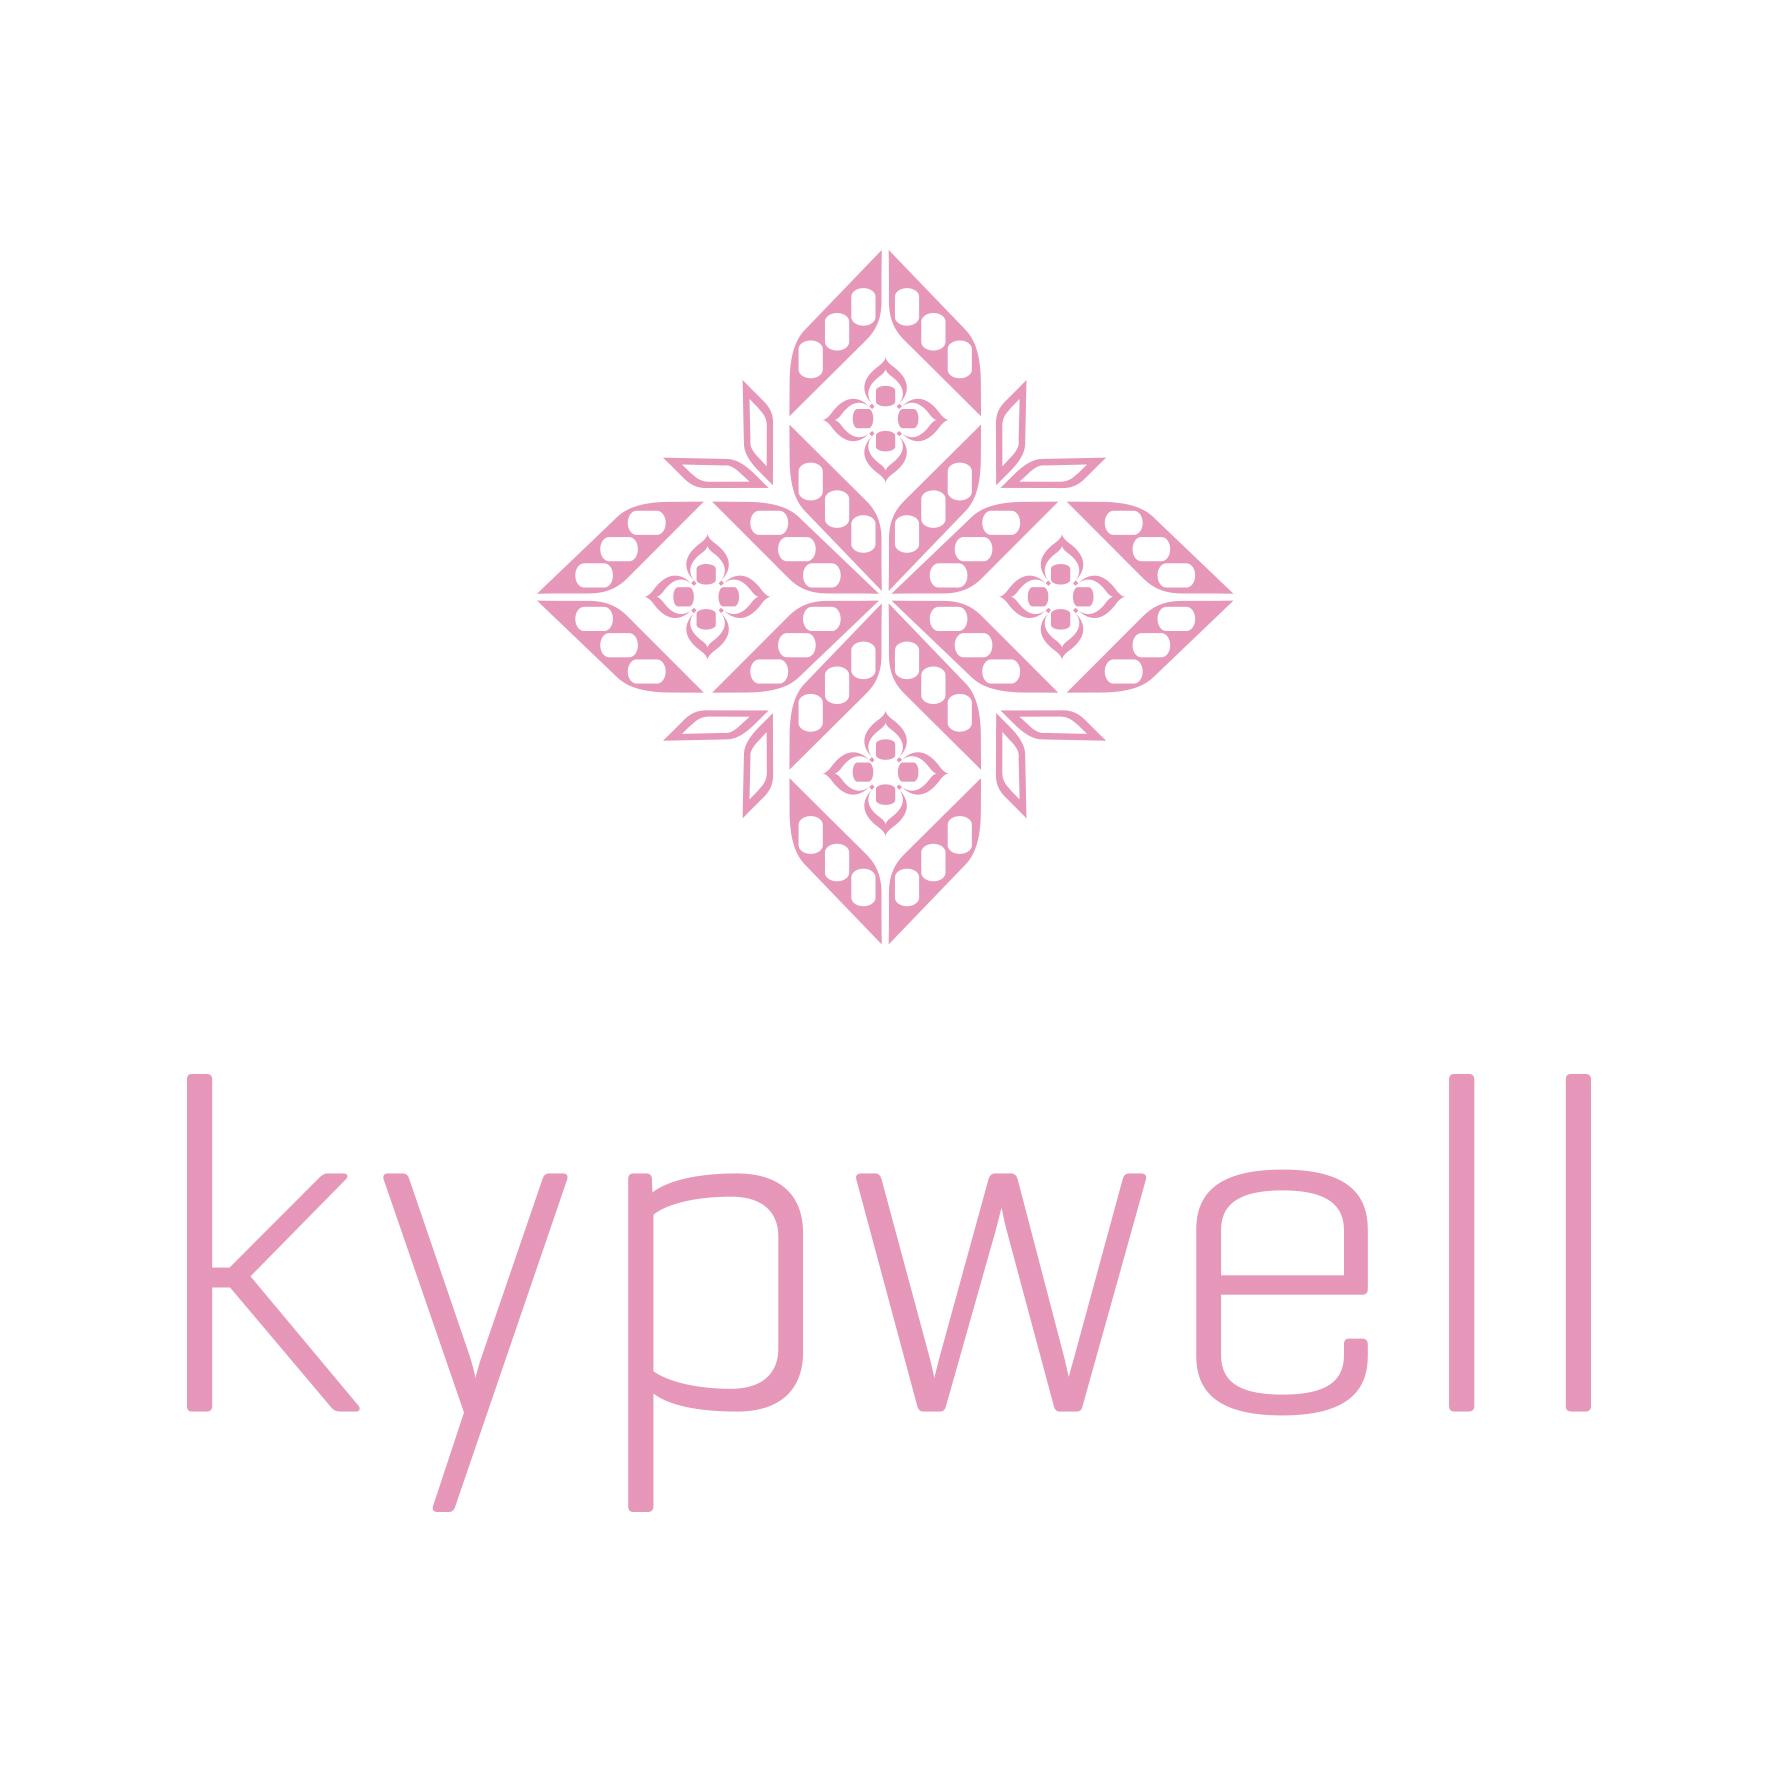 kypwell-logo-hight-res.jpg